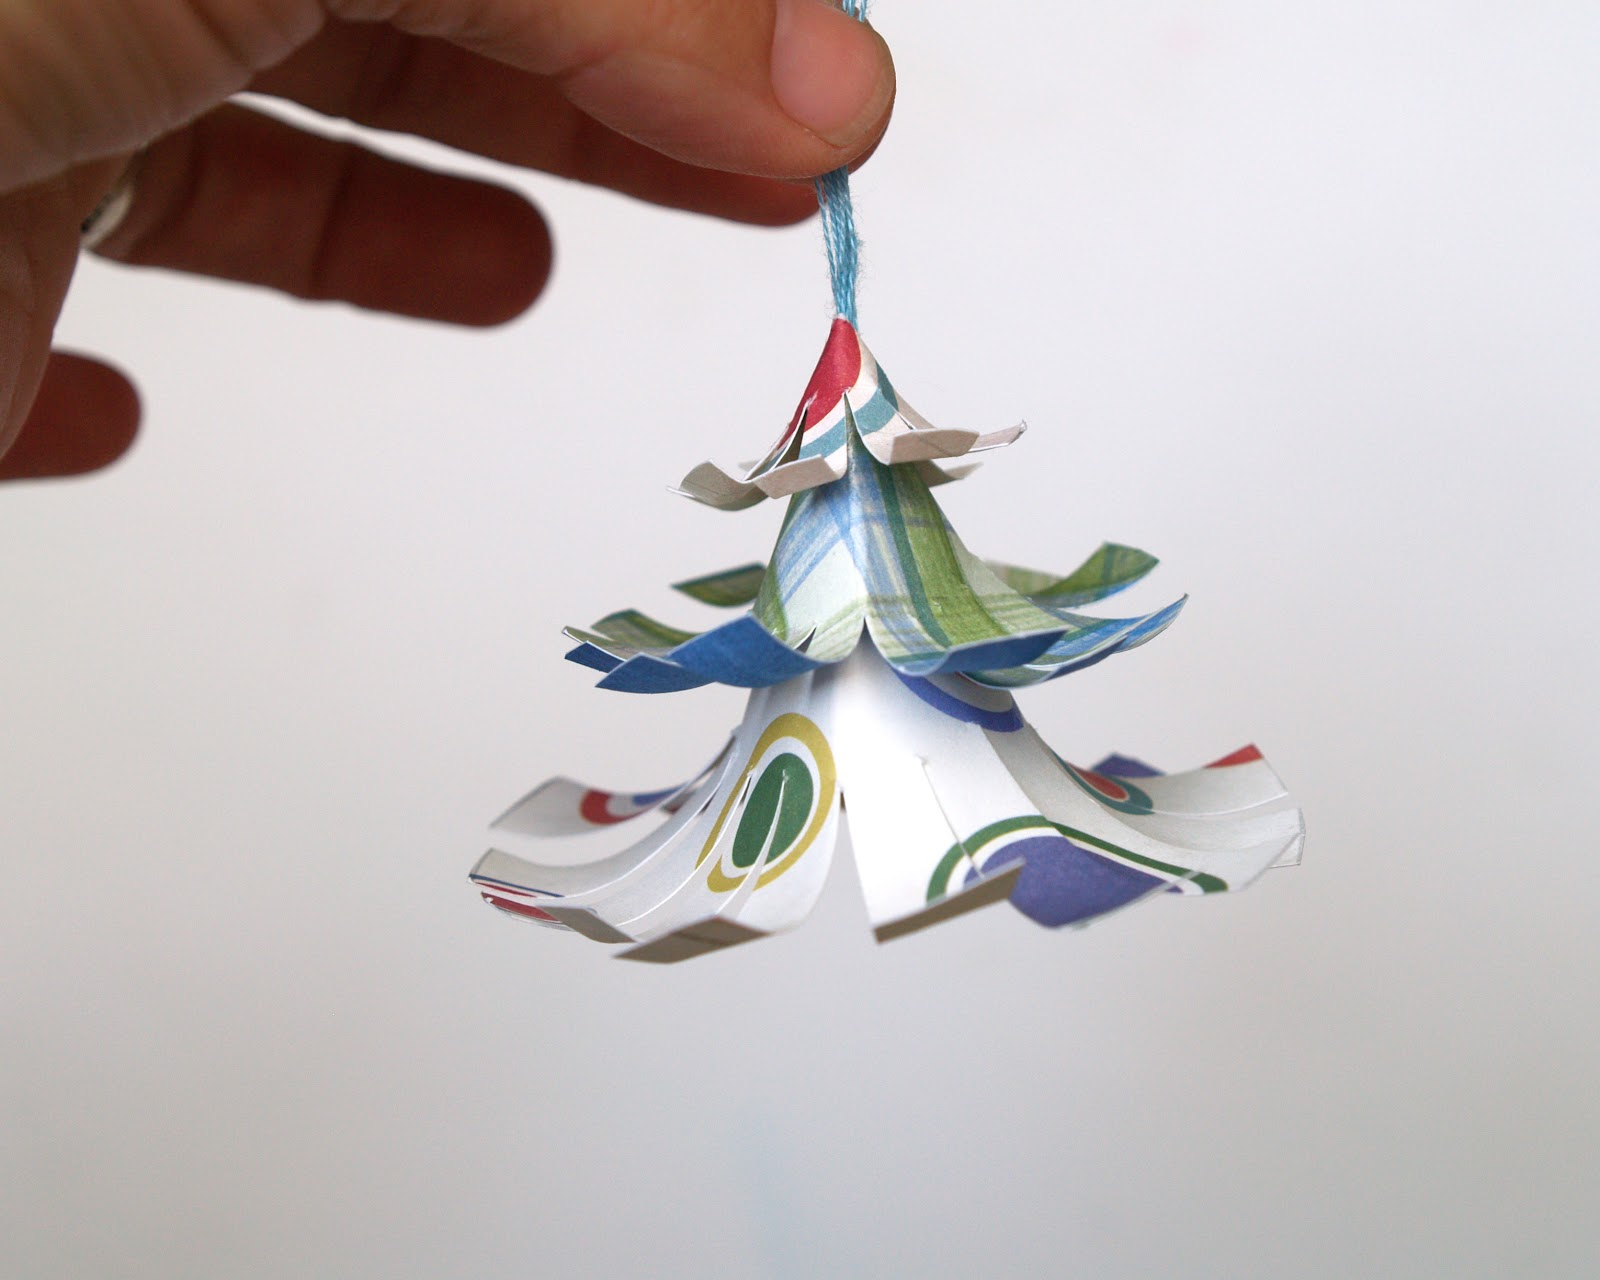 DIY Colorful Christmas Tree Ornament | ChristmasOrnaments.com